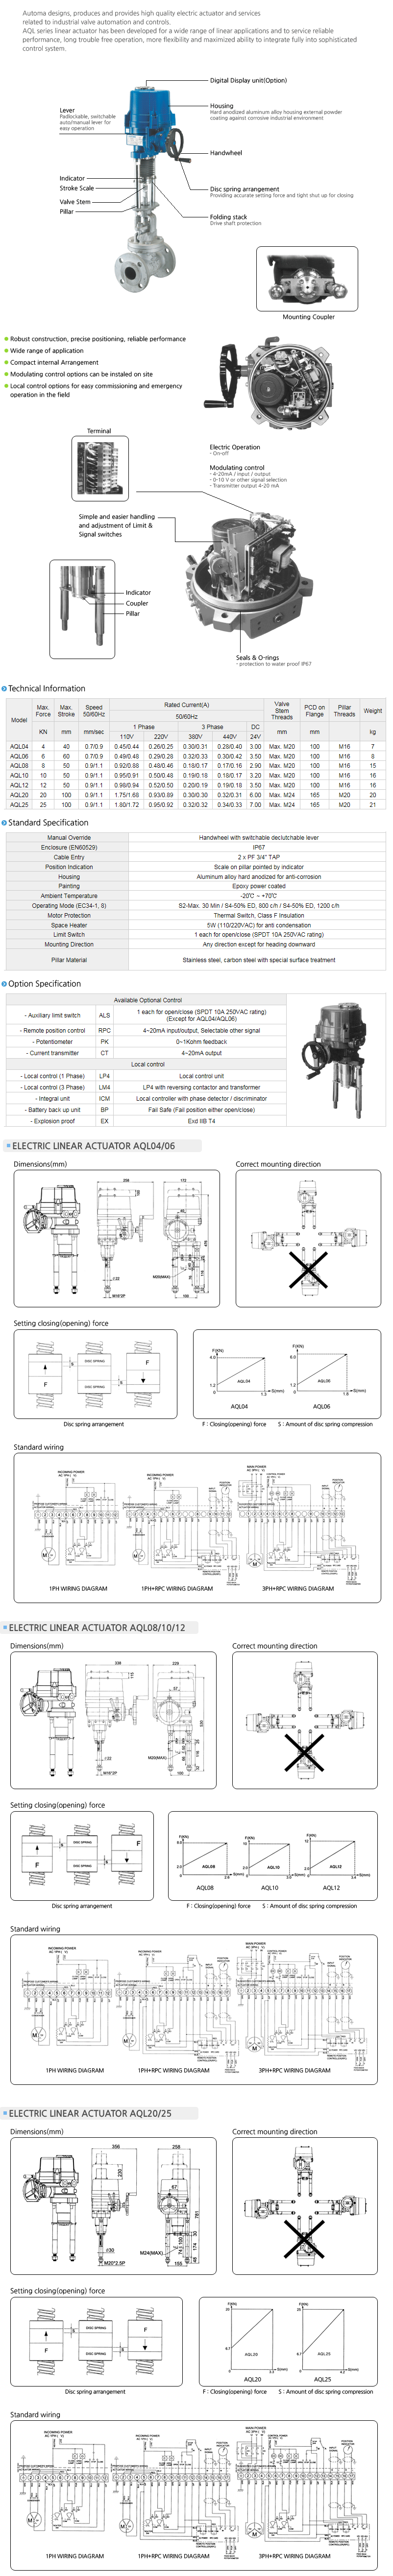 AUTOMA Electric Actuator (Linear Type Actuator) AQL/AGL Series